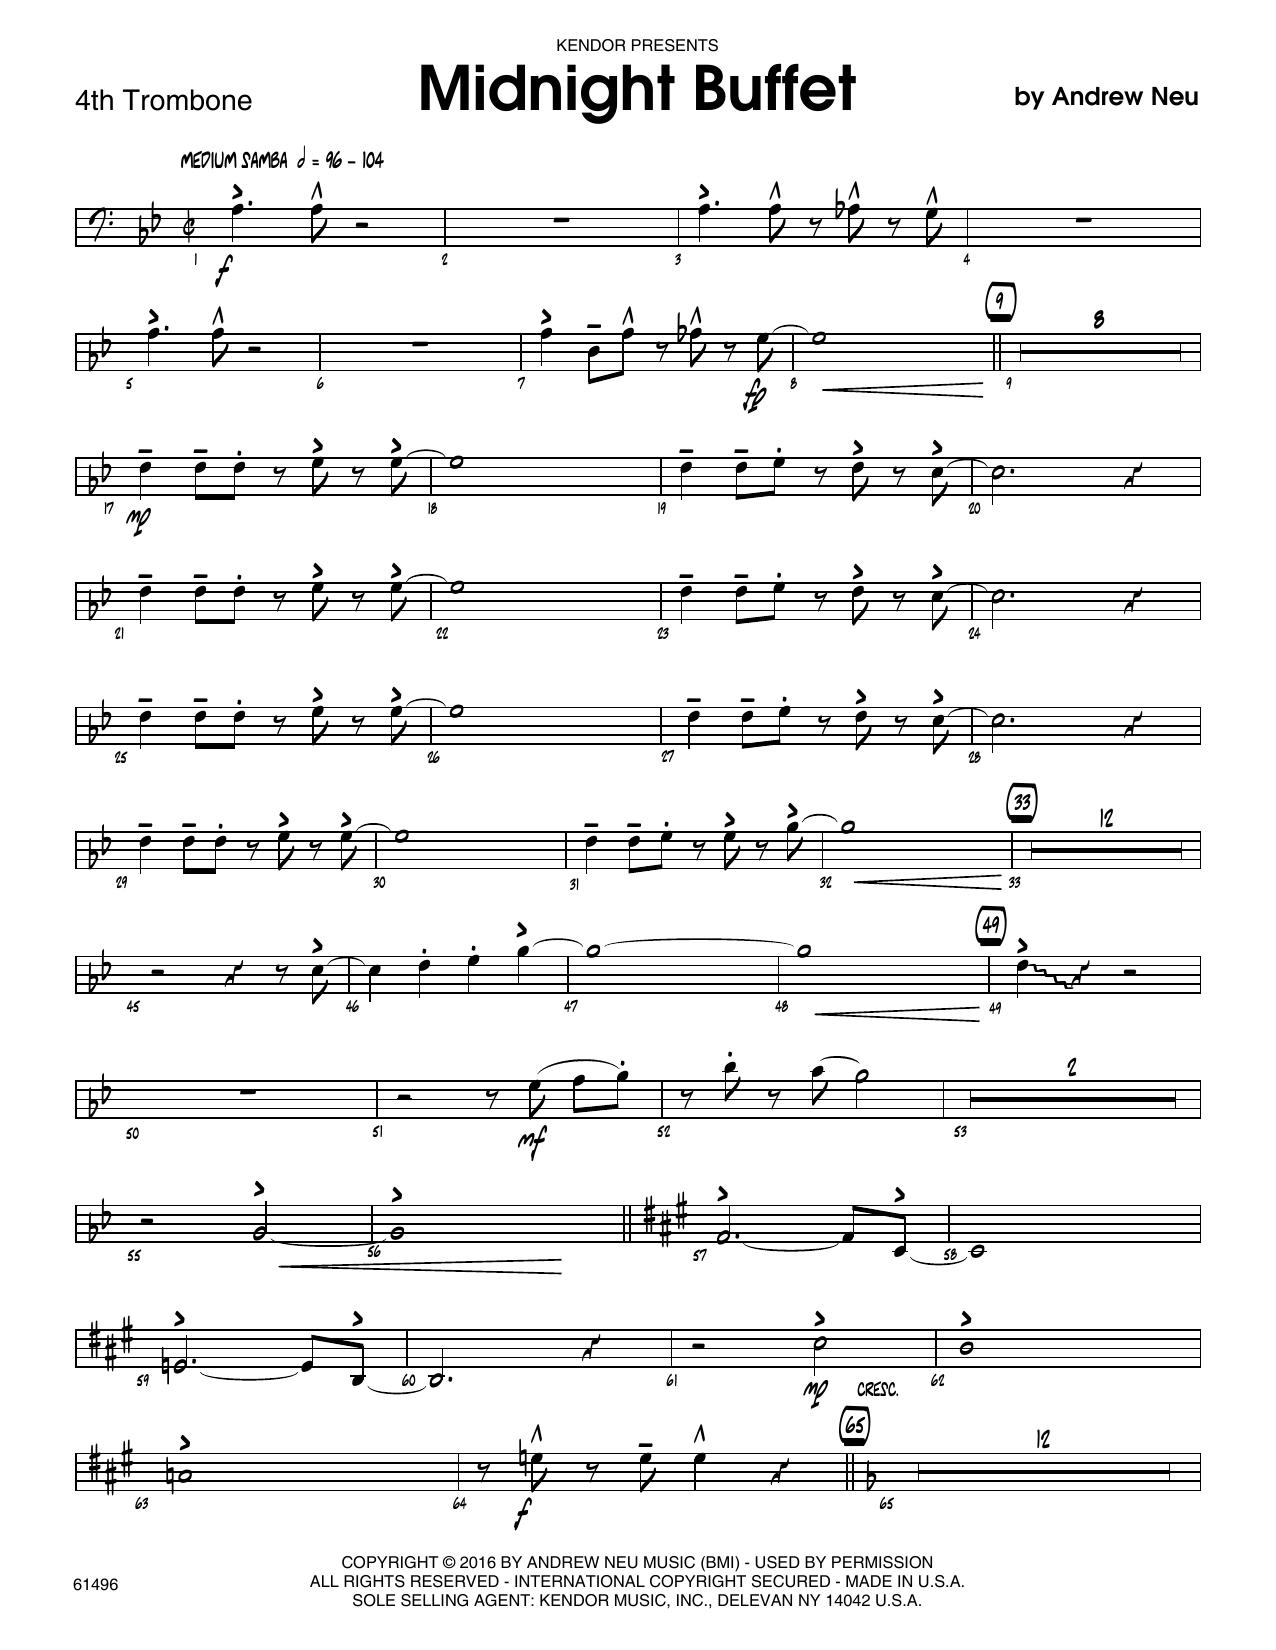 Midnight Buffet - 4th Trombone Sheet Music